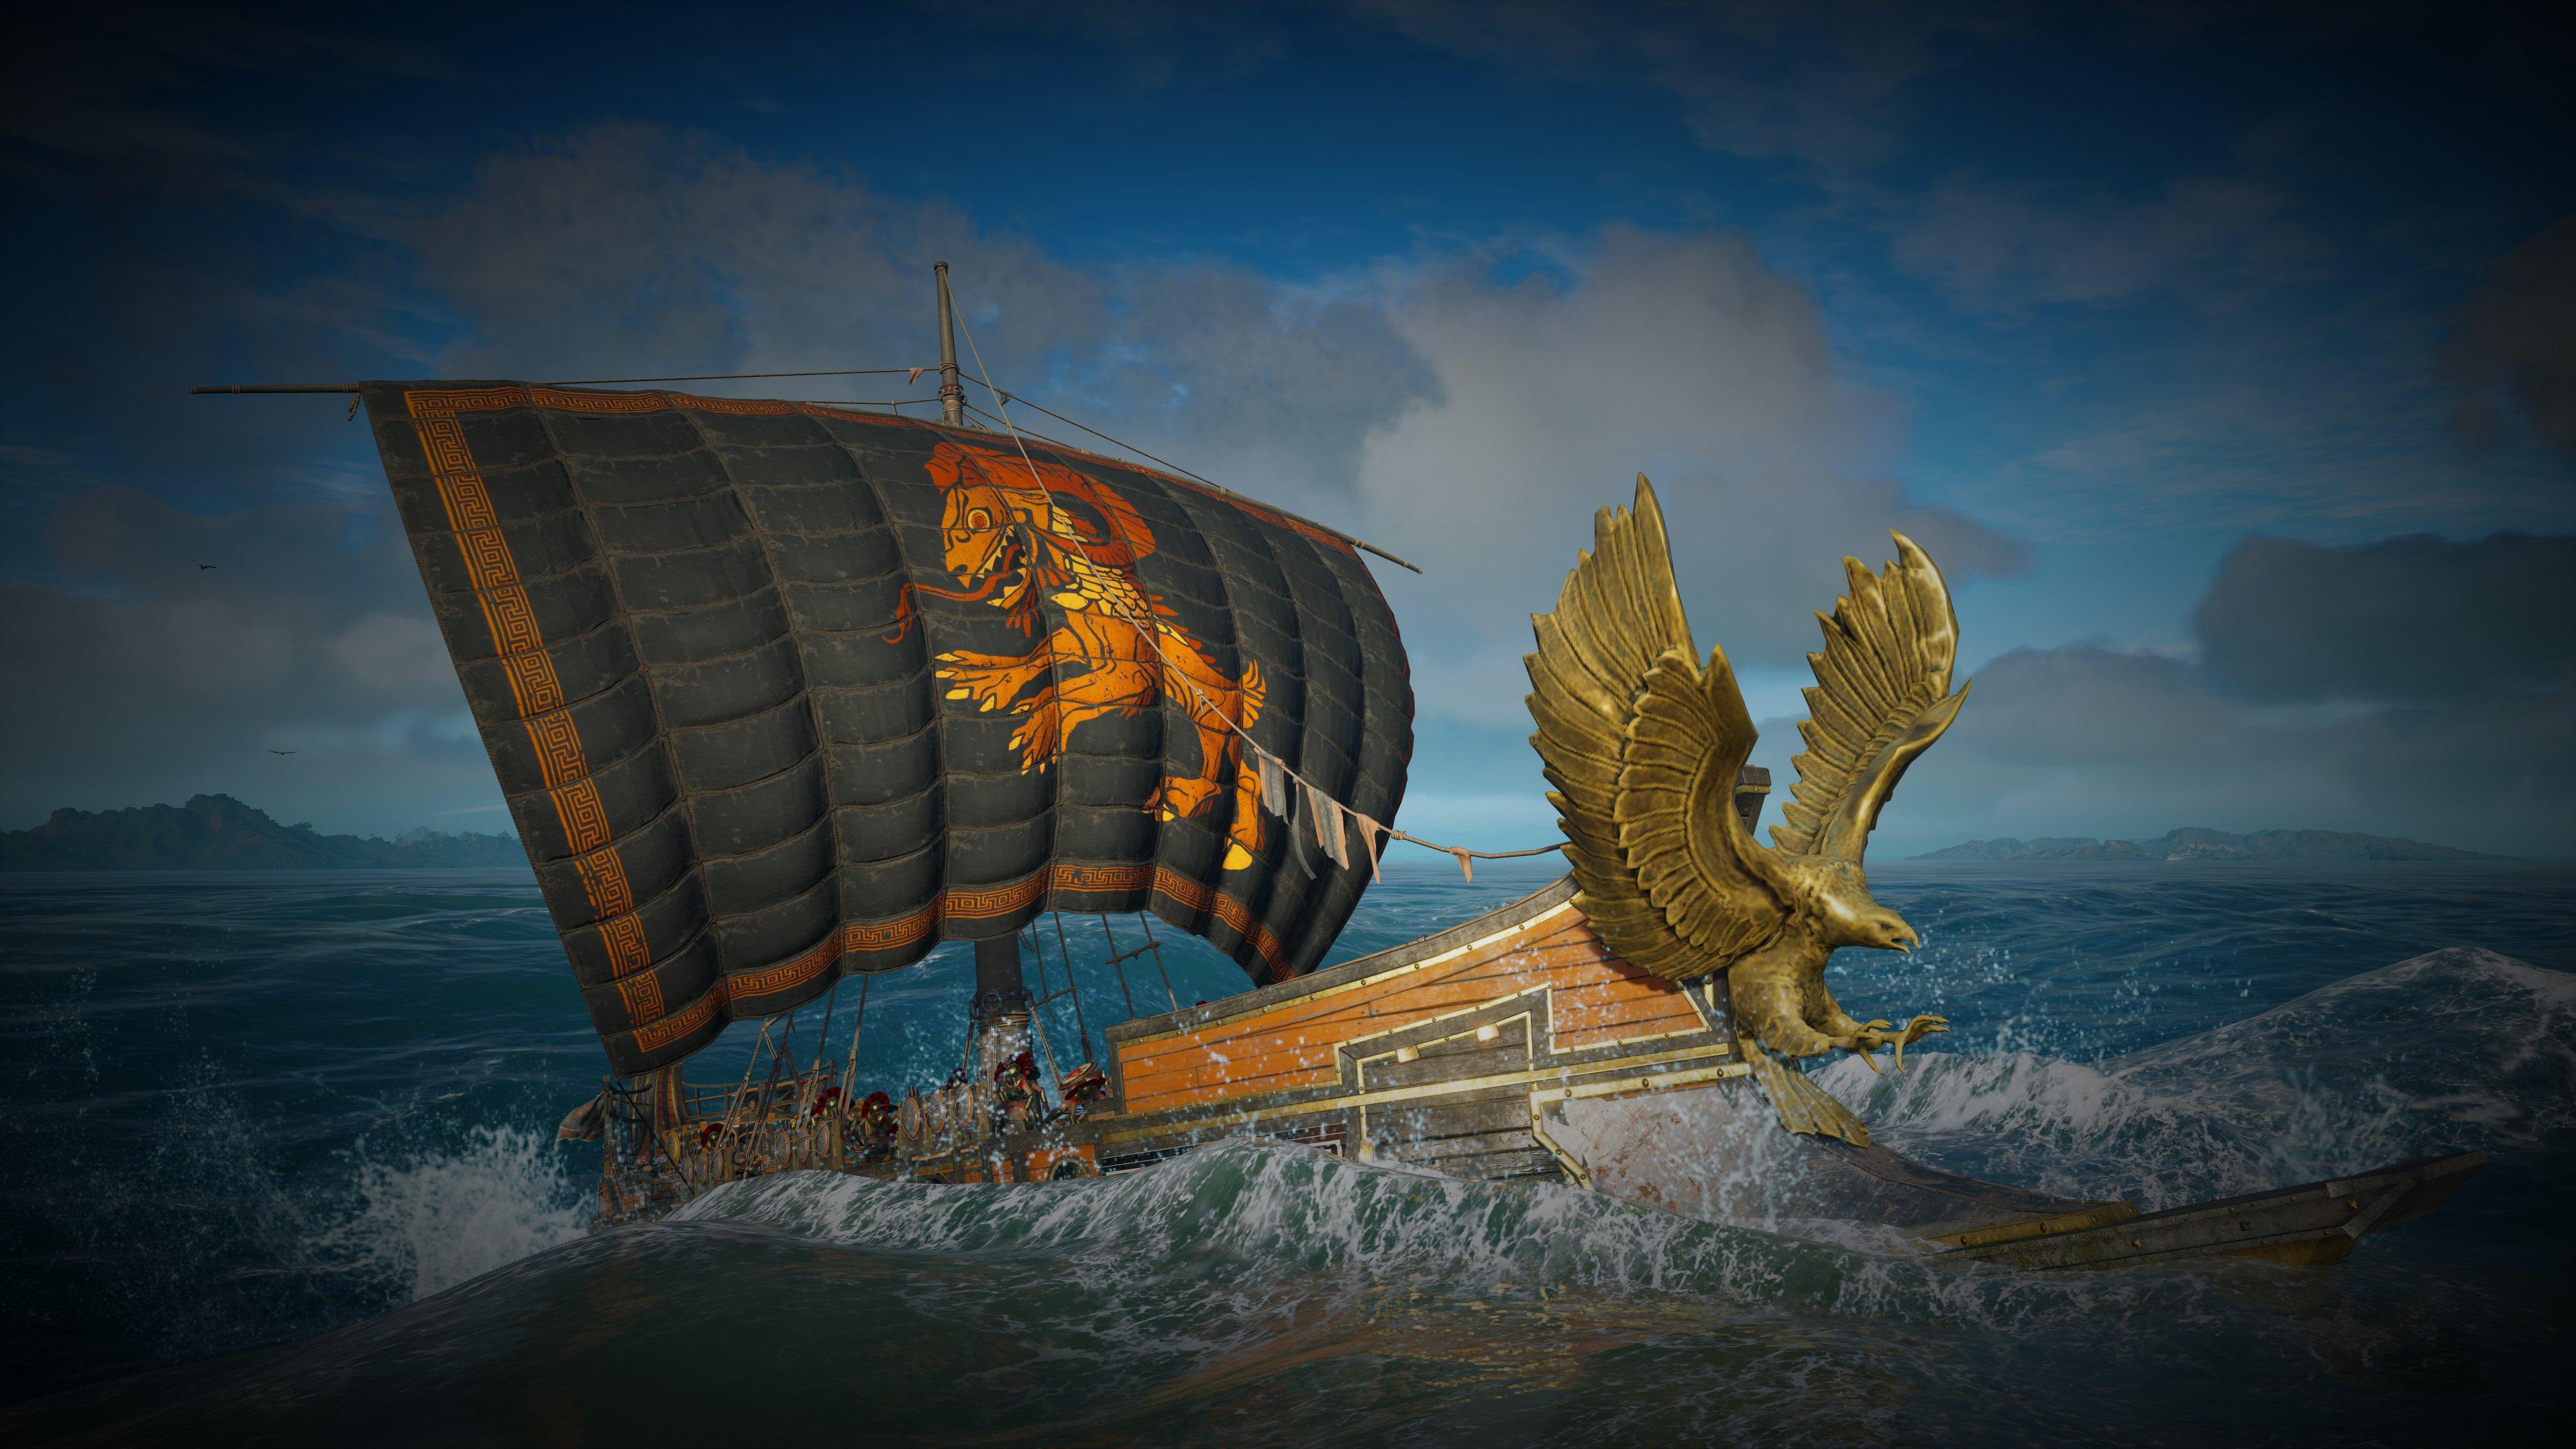 20181026222158.jpg - Assassin's Creed: Odyssey